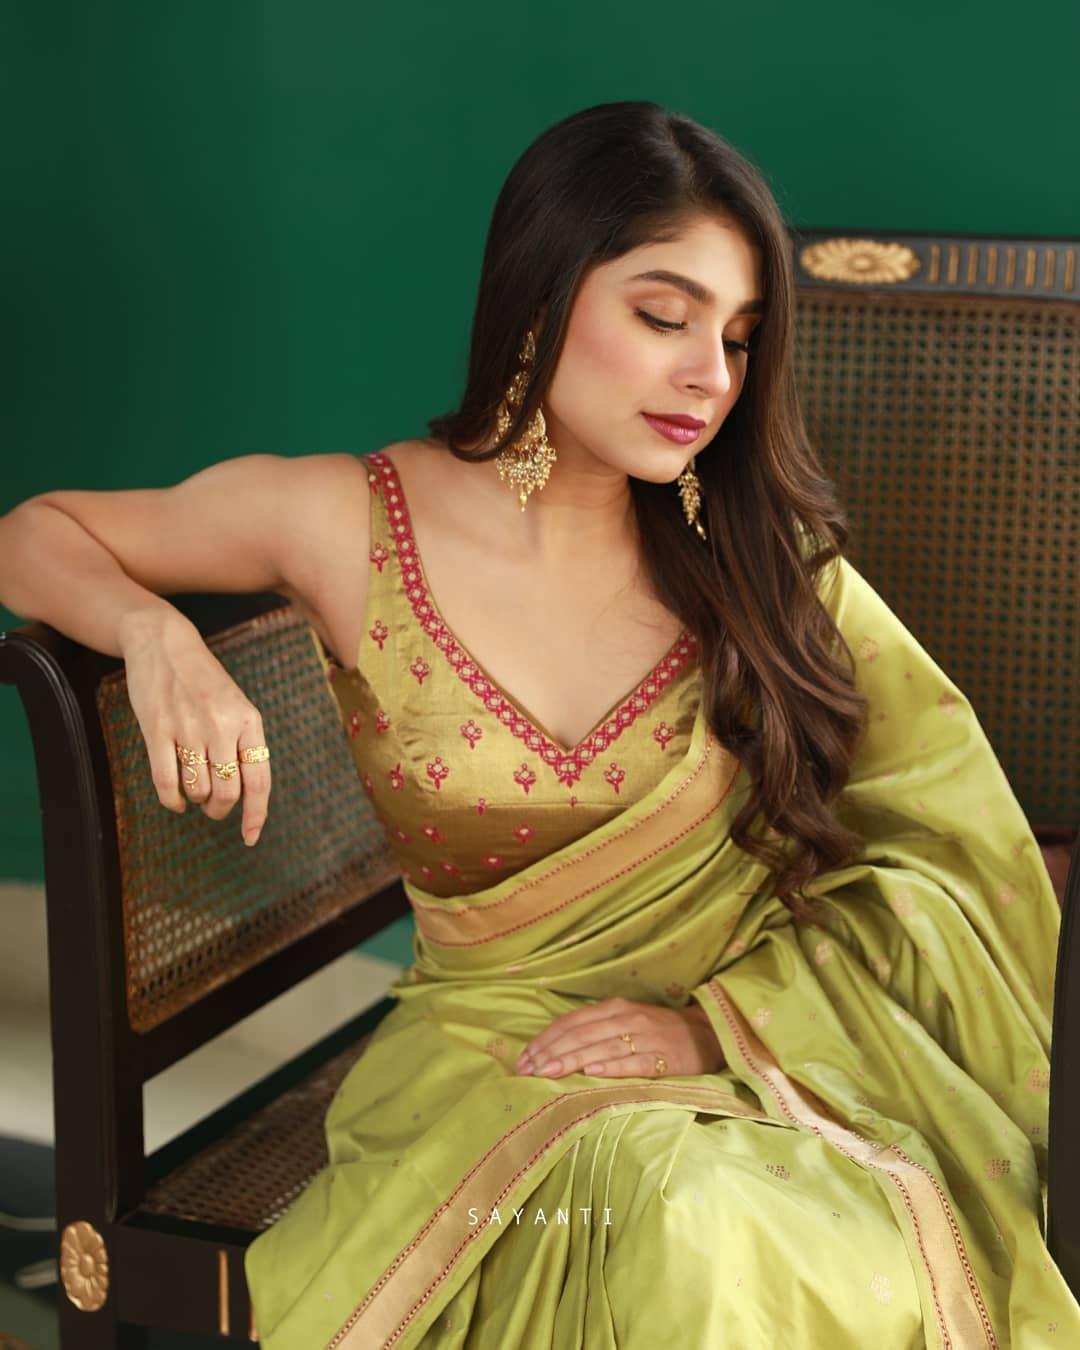 Lime green sleeveless blouse-Sayanti Ghosh